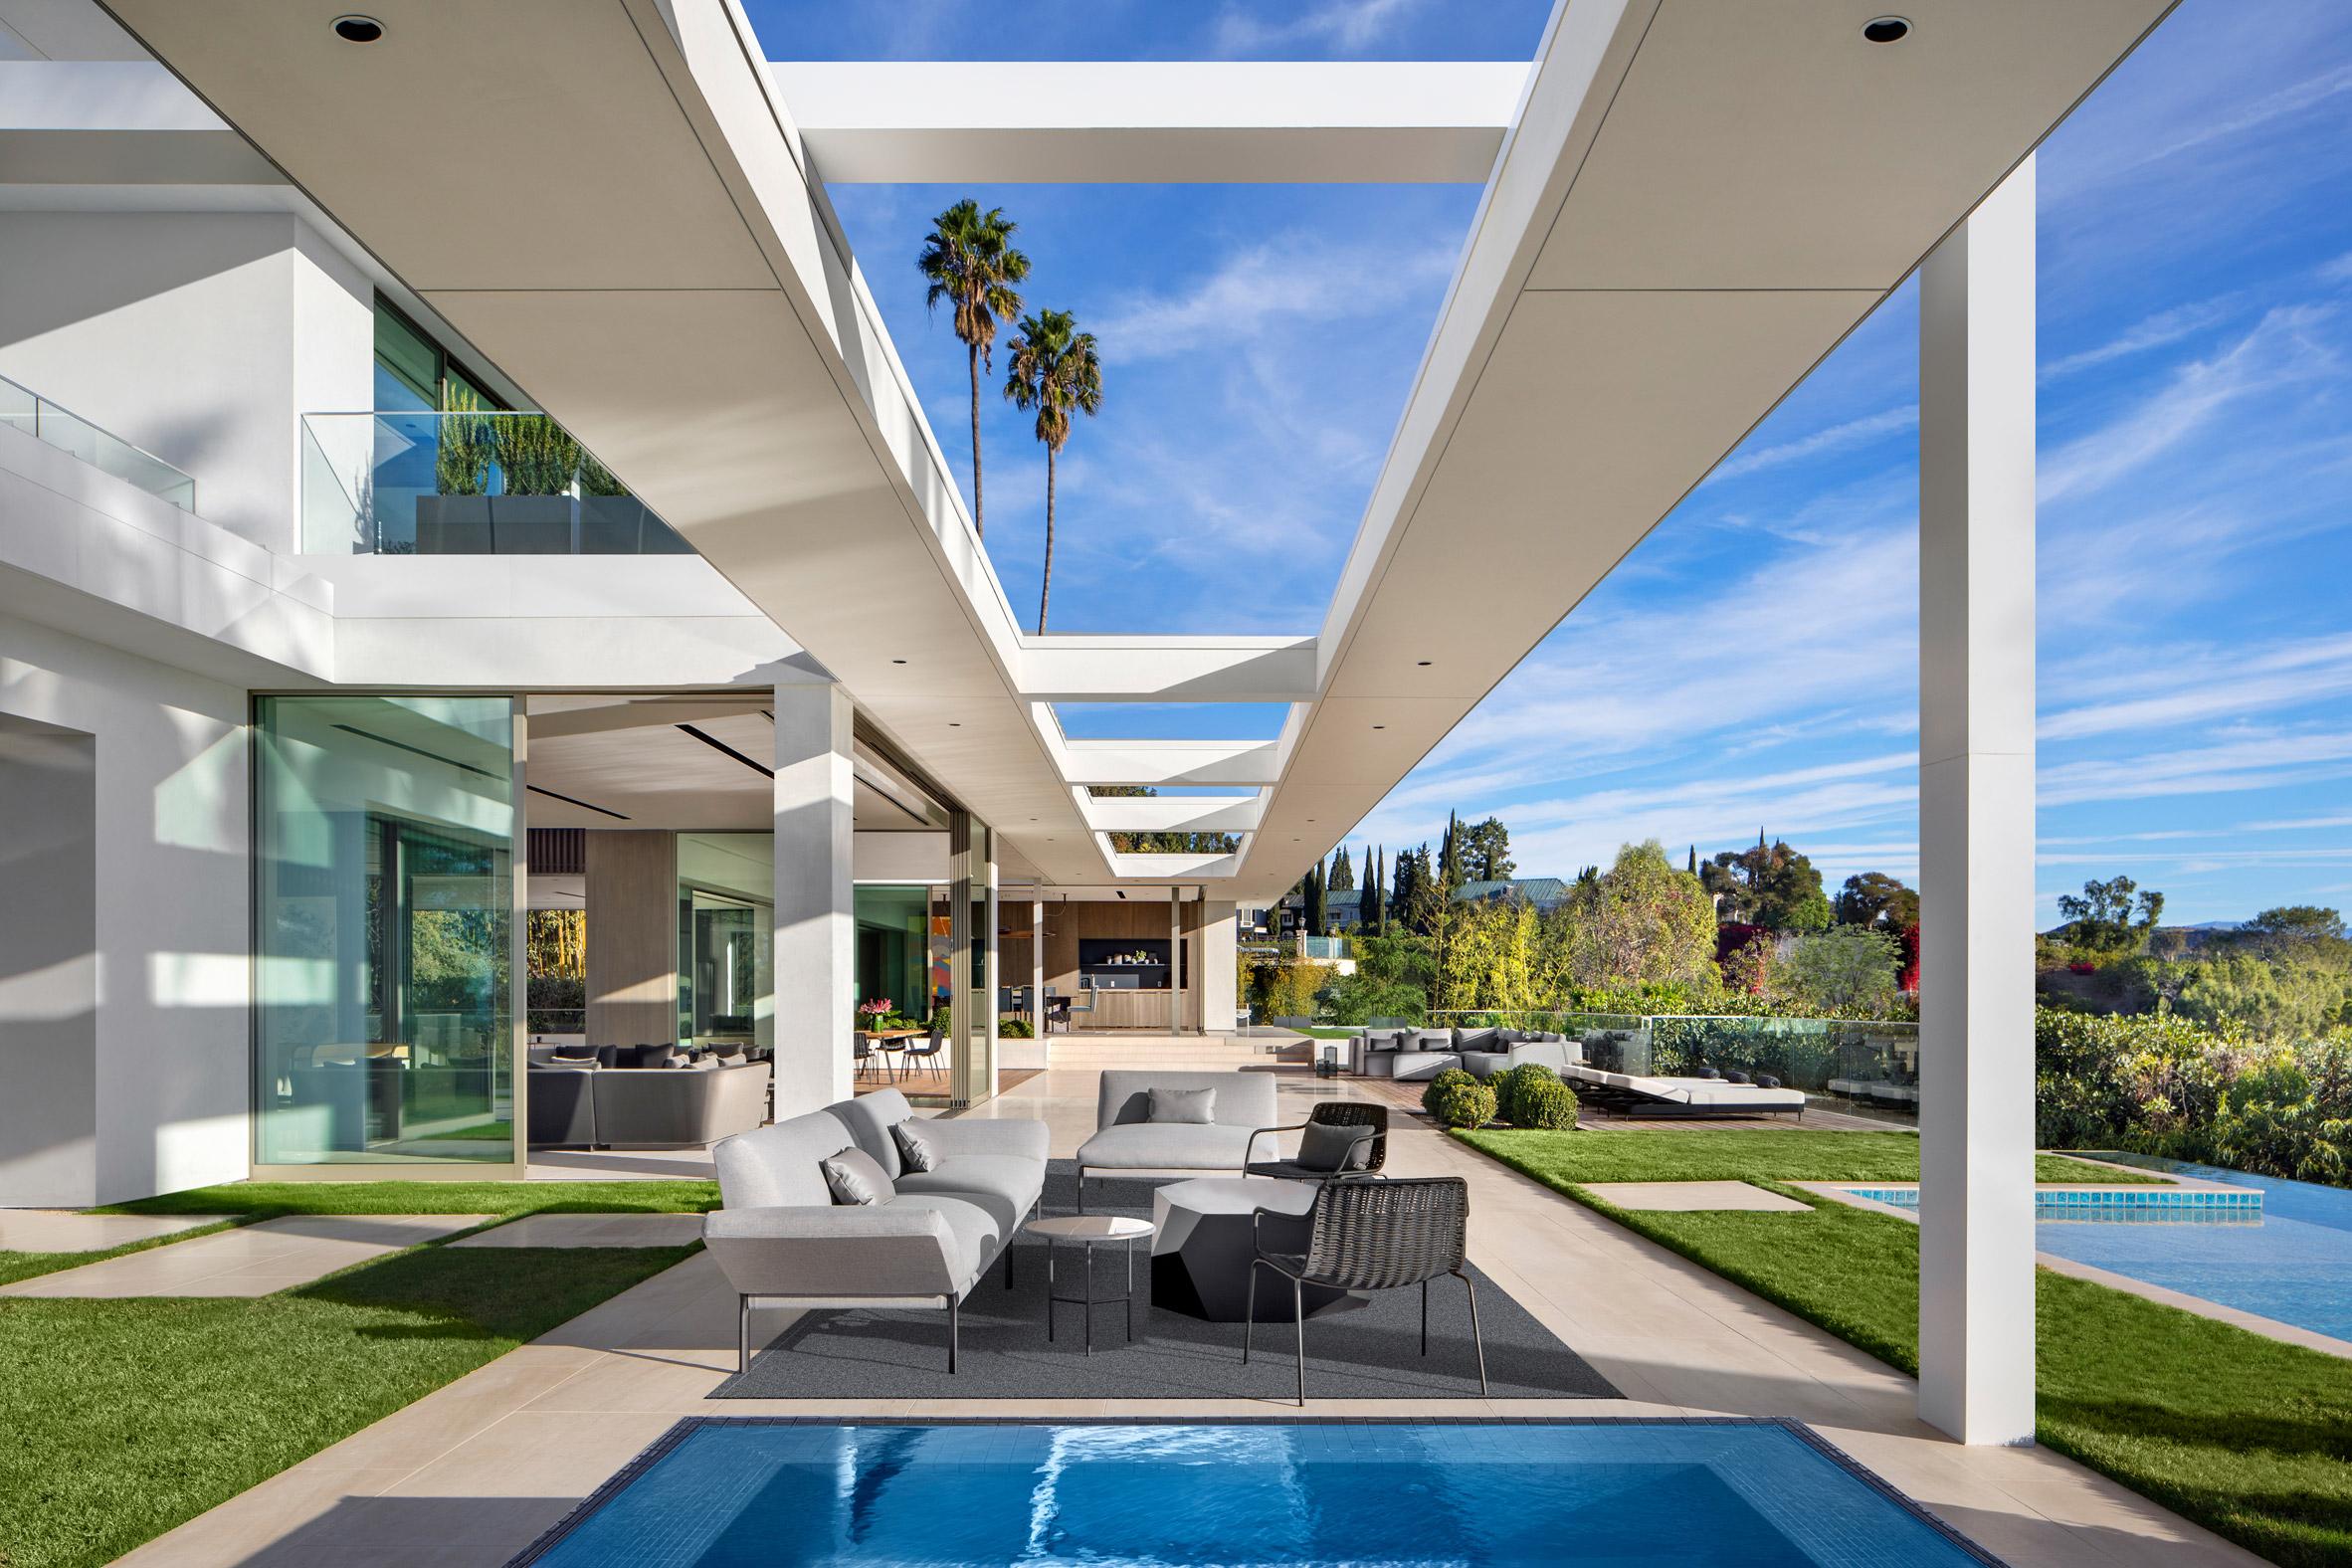 saota turns spanish-style house